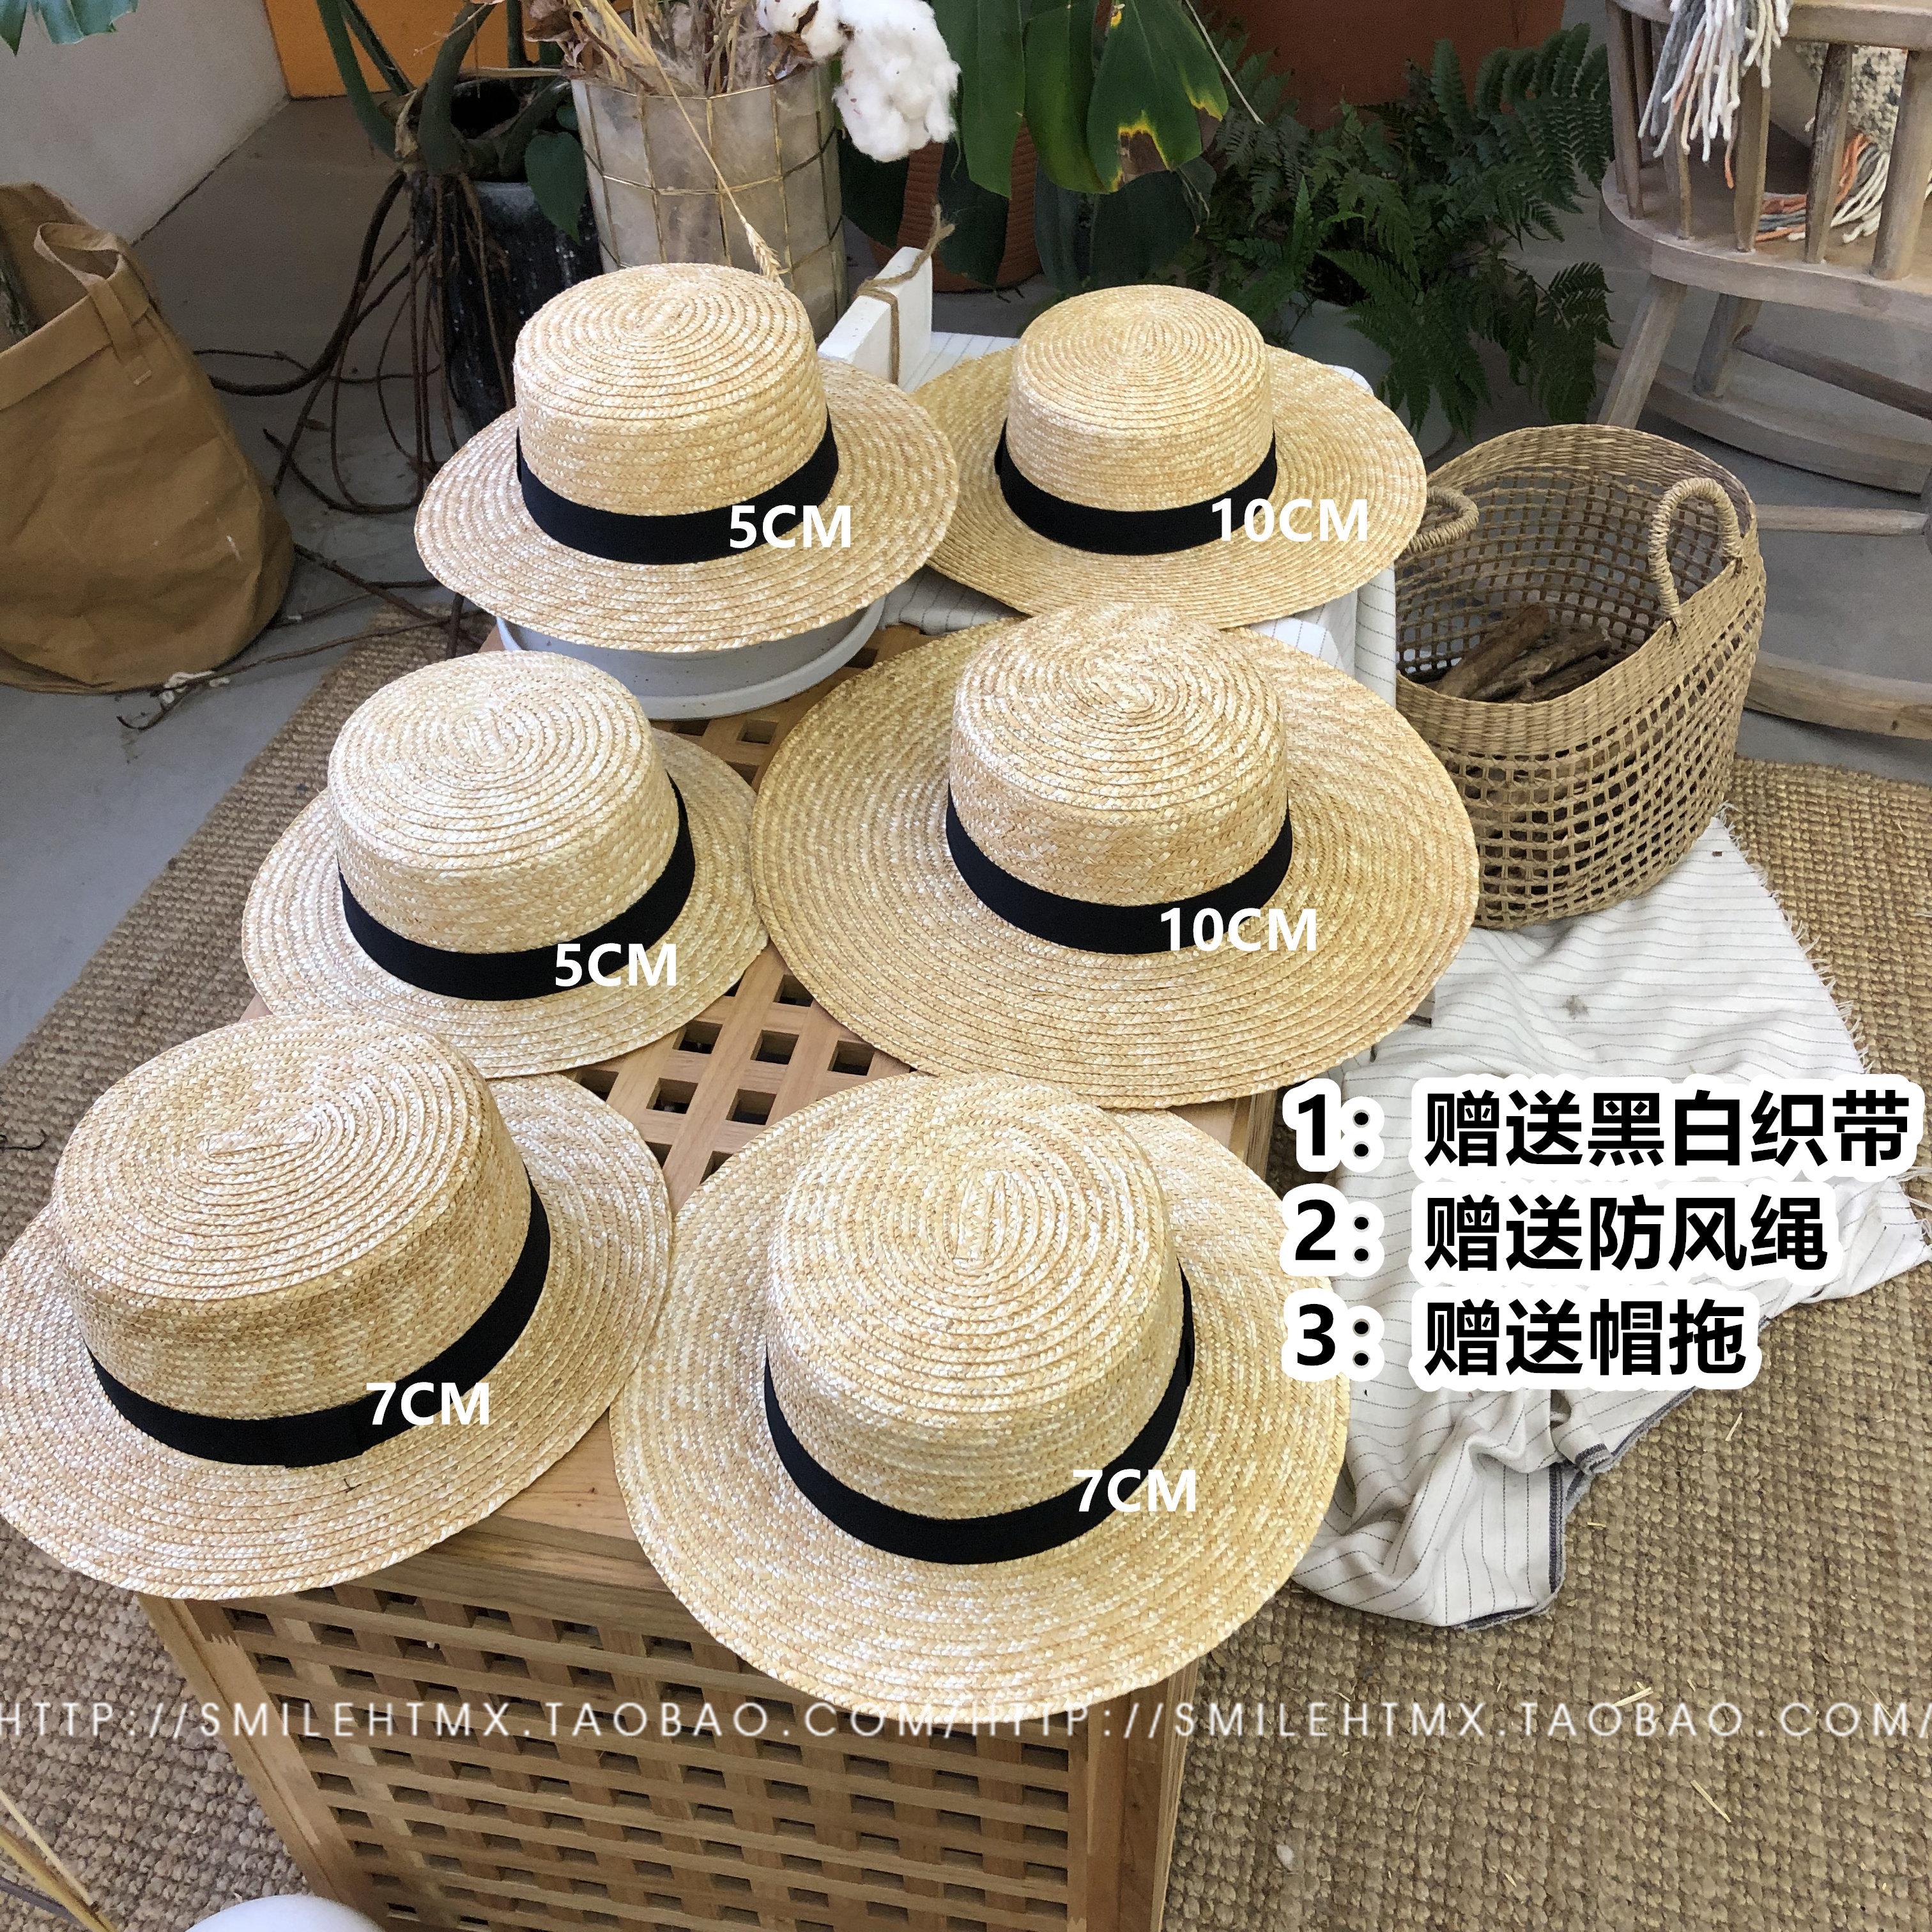 Шляпы для женщин Артикул 585133486641